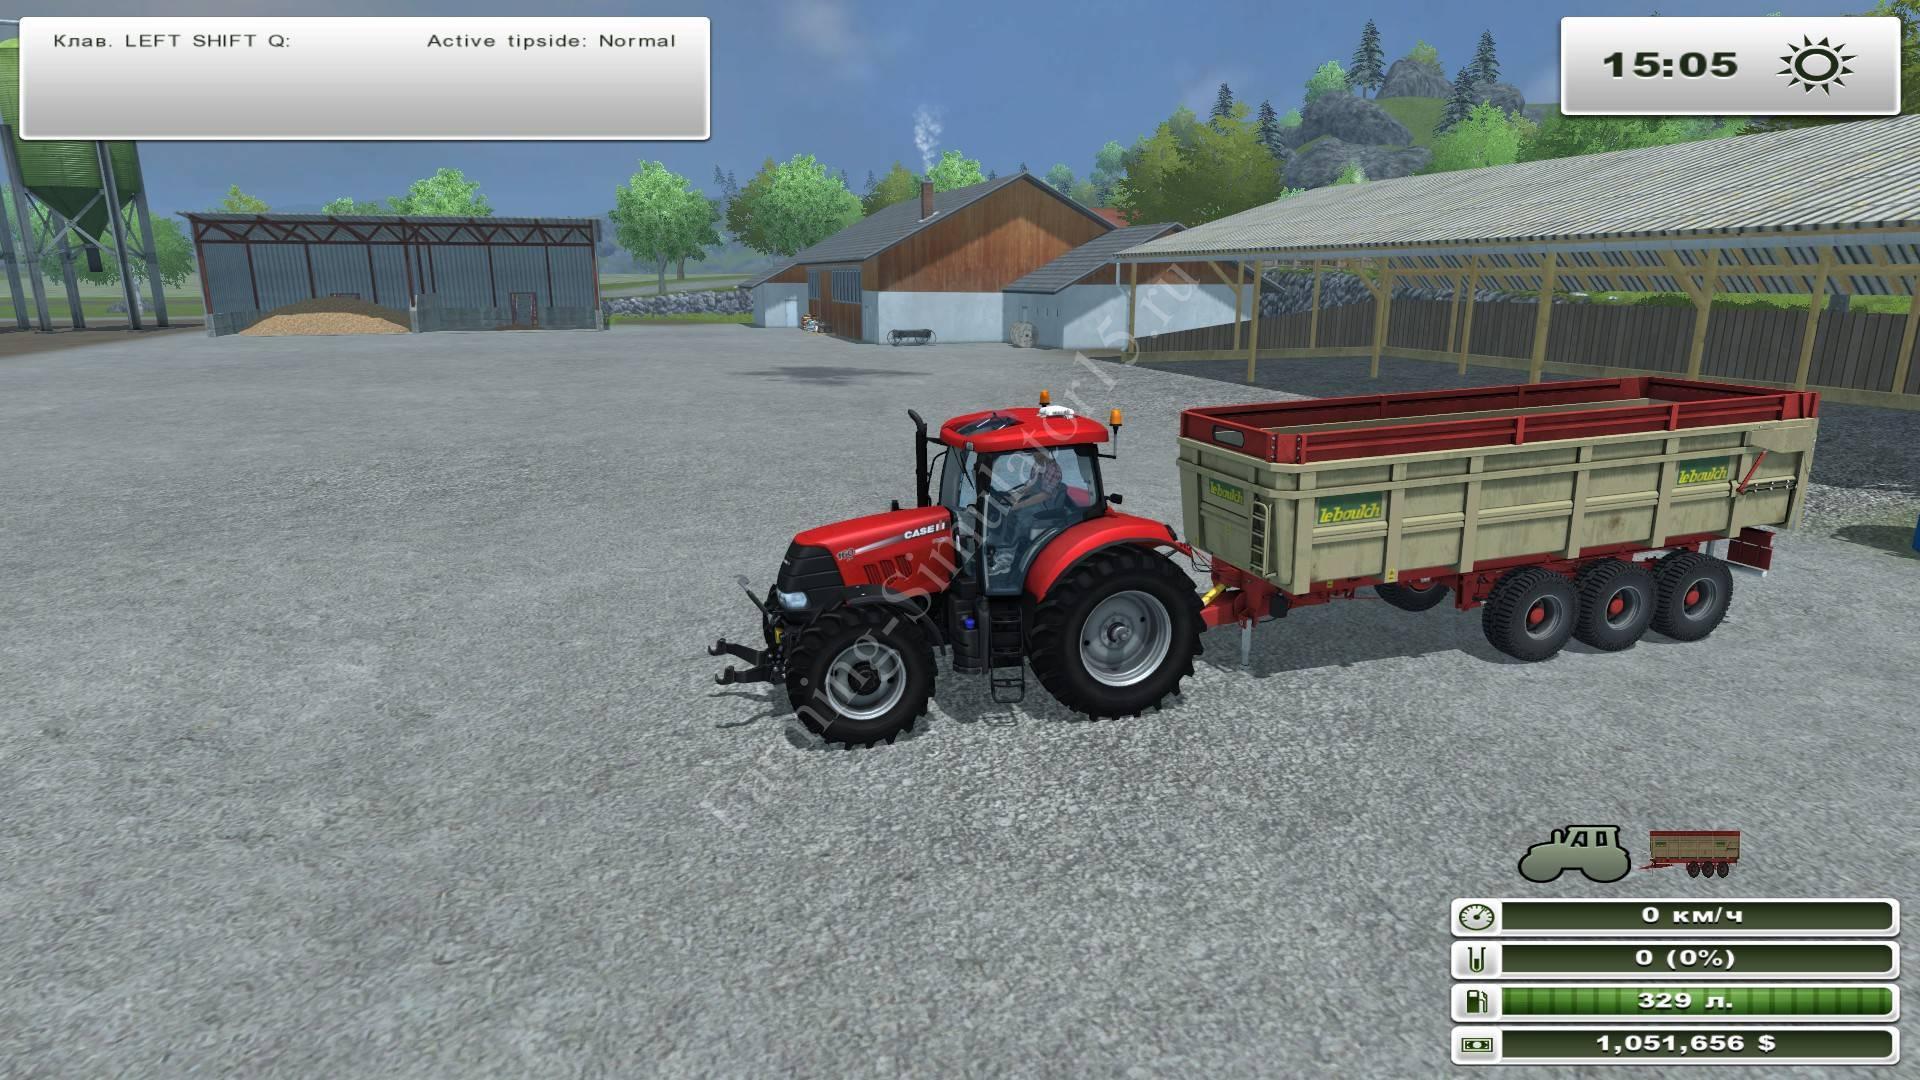 Мод трехосного прицепа Leboulch tridem Gold v 1.1 Farming Simulator 2013, Farming Simulator 13